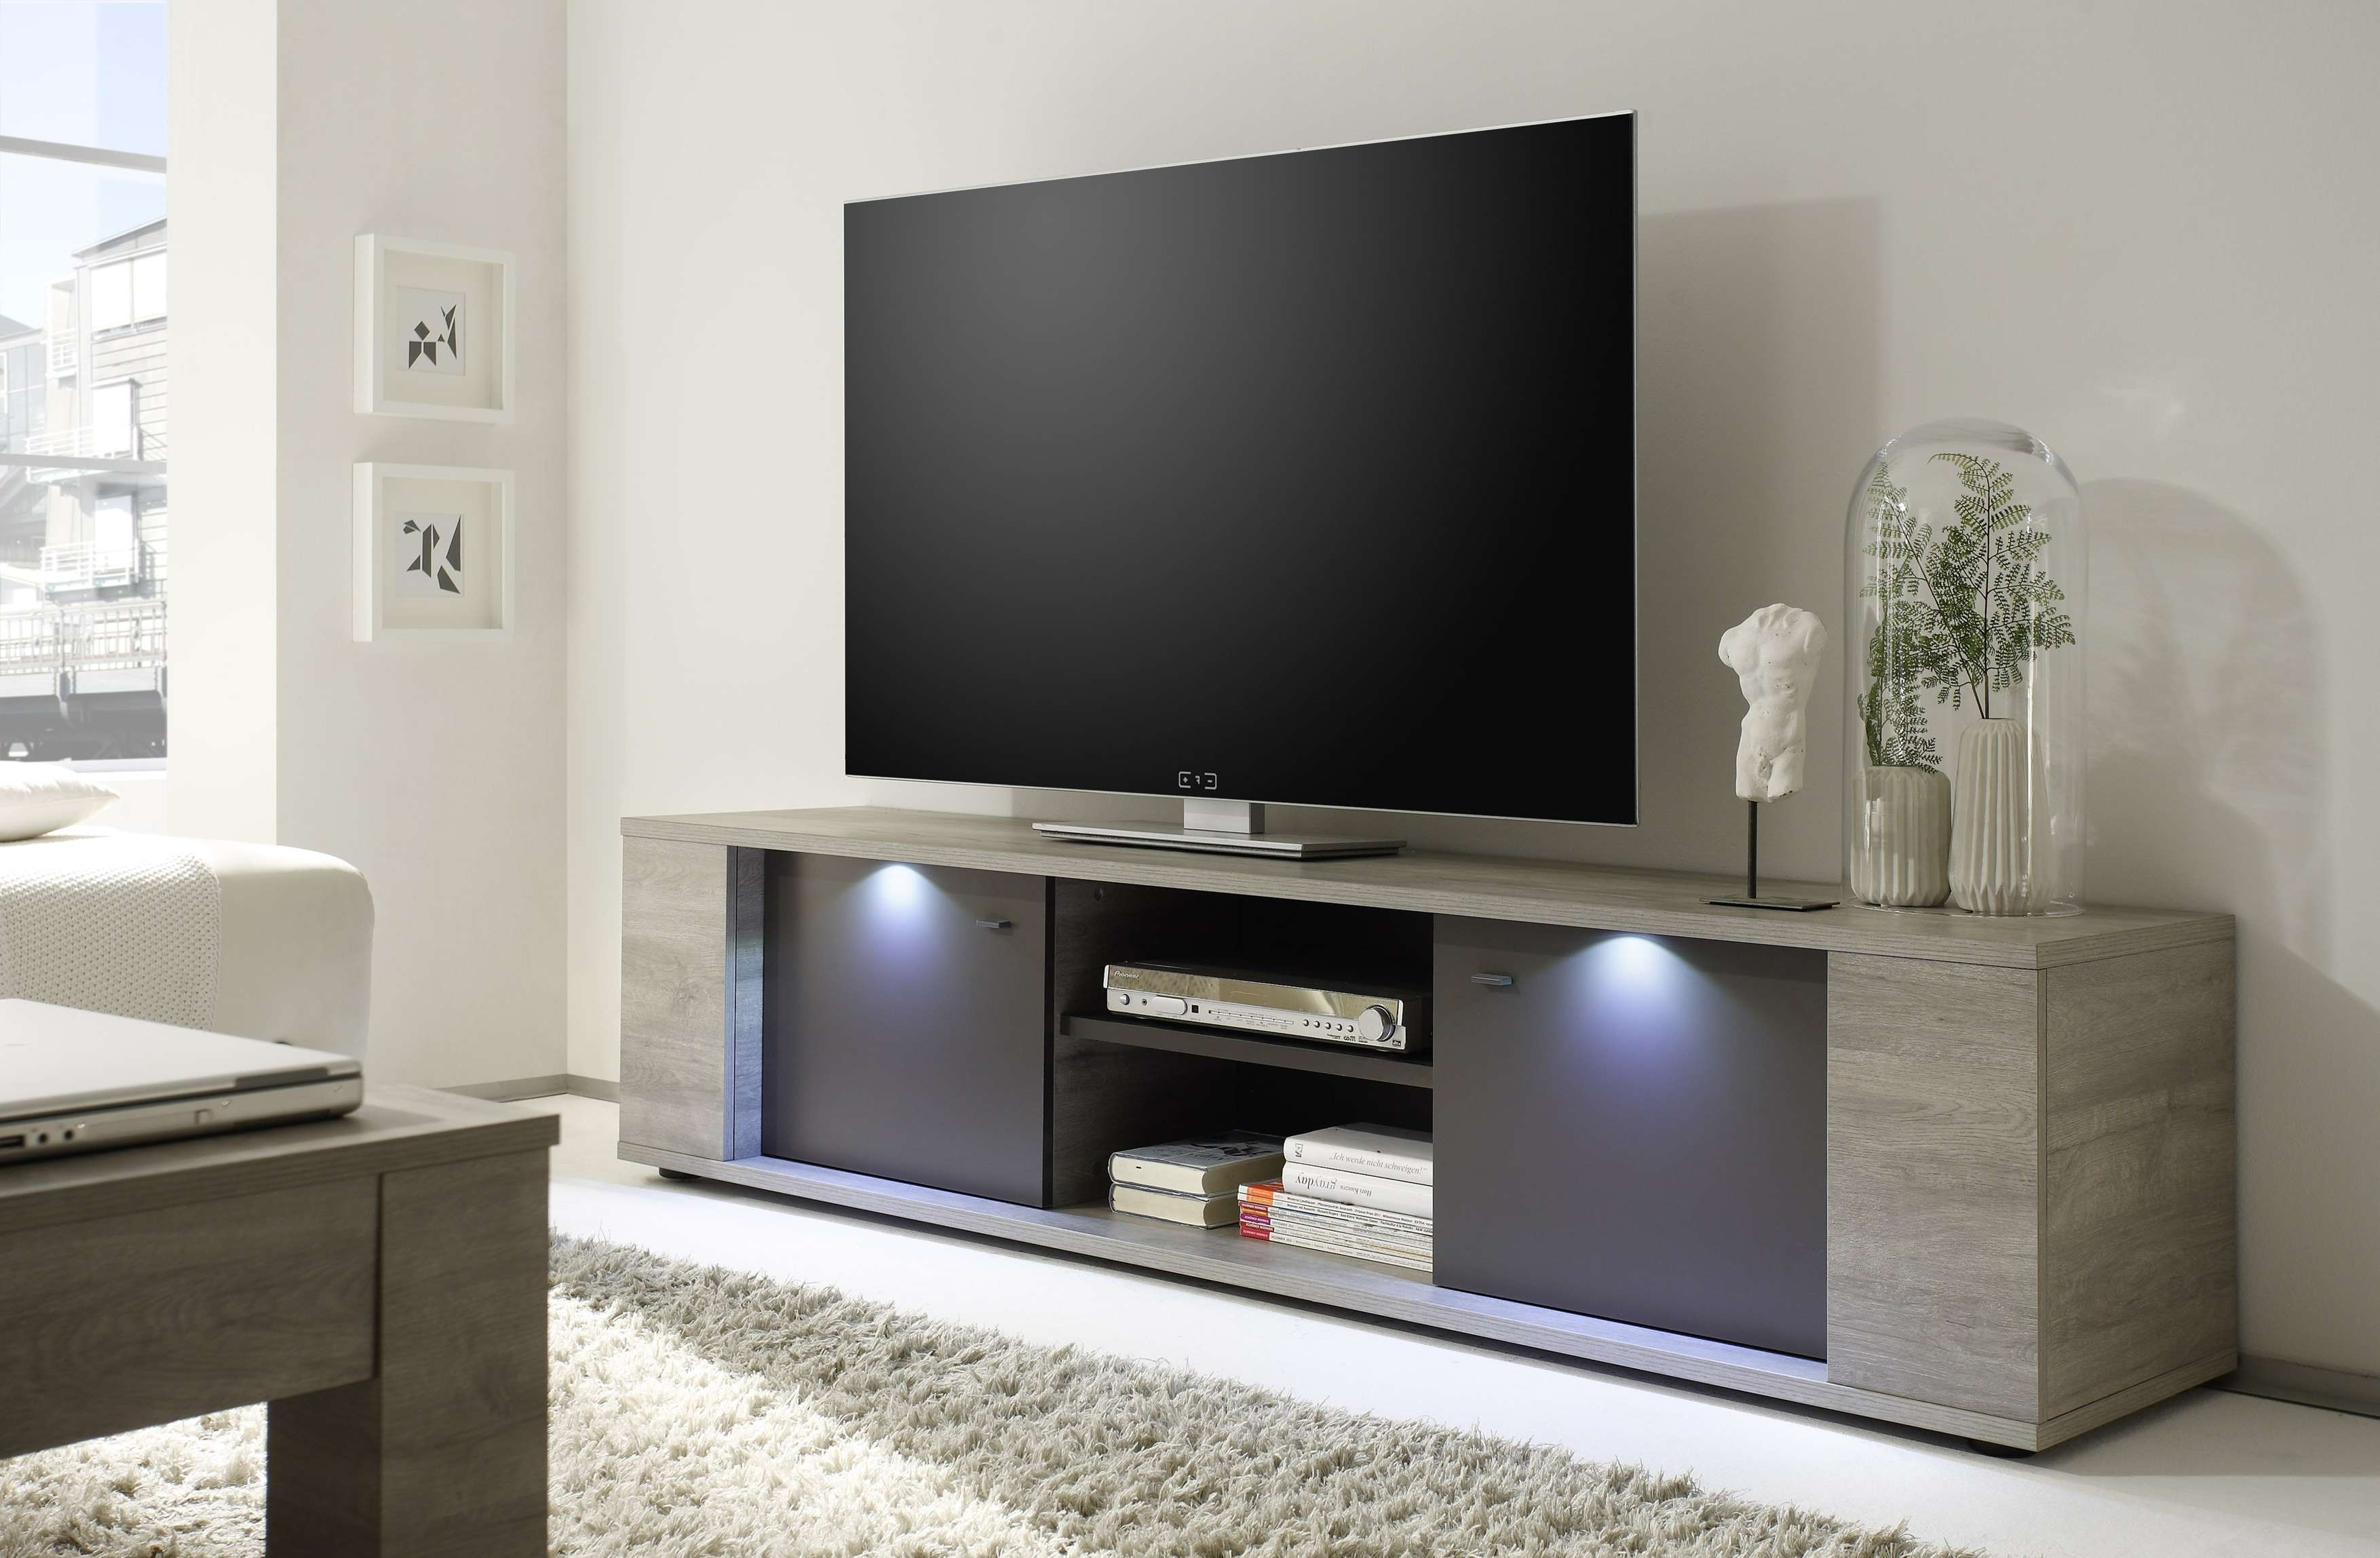 Living ~ Marvelous Wall Tv Unit Inside Unique Brisbane Floating Tv Regarding Big Tv Stands Furniture (View 2 of 15)